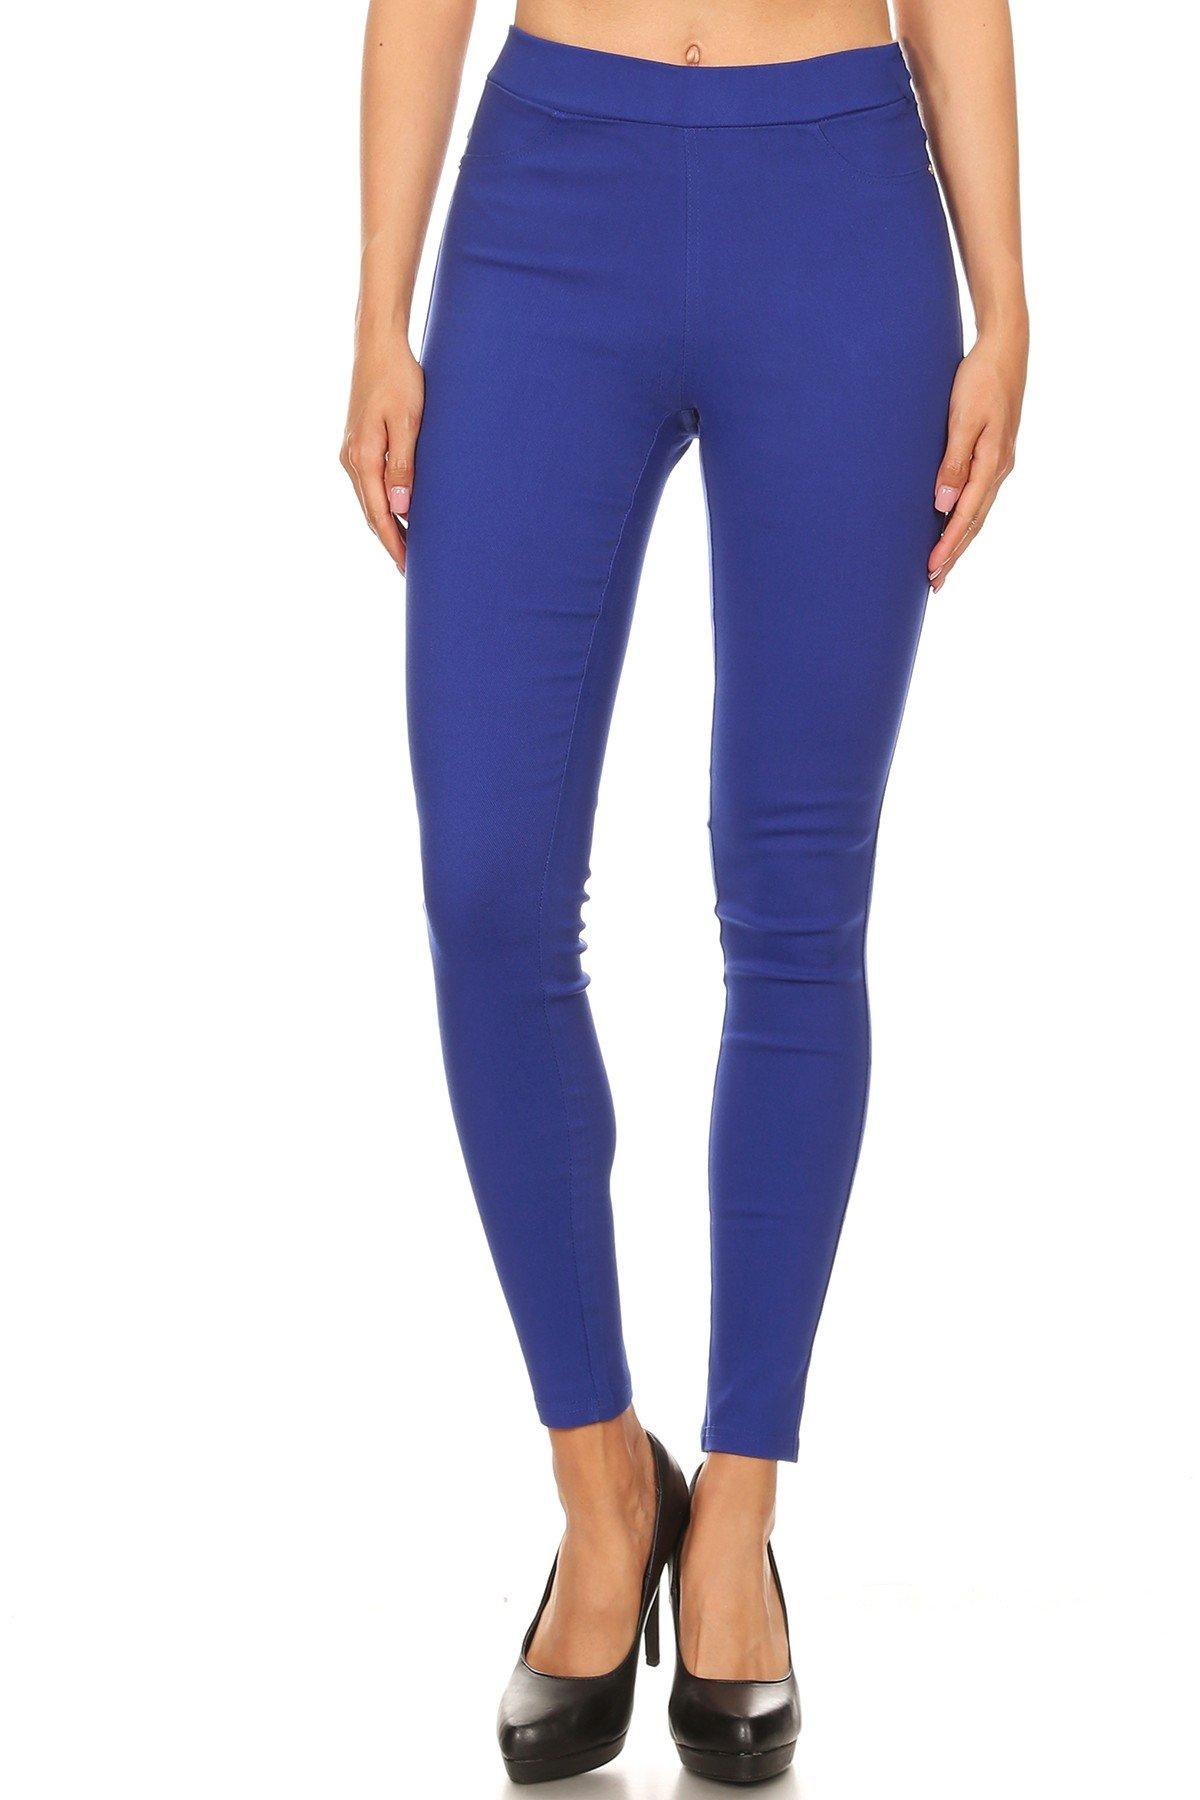 Jvini Women's High Waist Pull-On Skinny Super Stretchy Jeggings & Capris Regular & Plus Size (X-Large, Coba Blue)